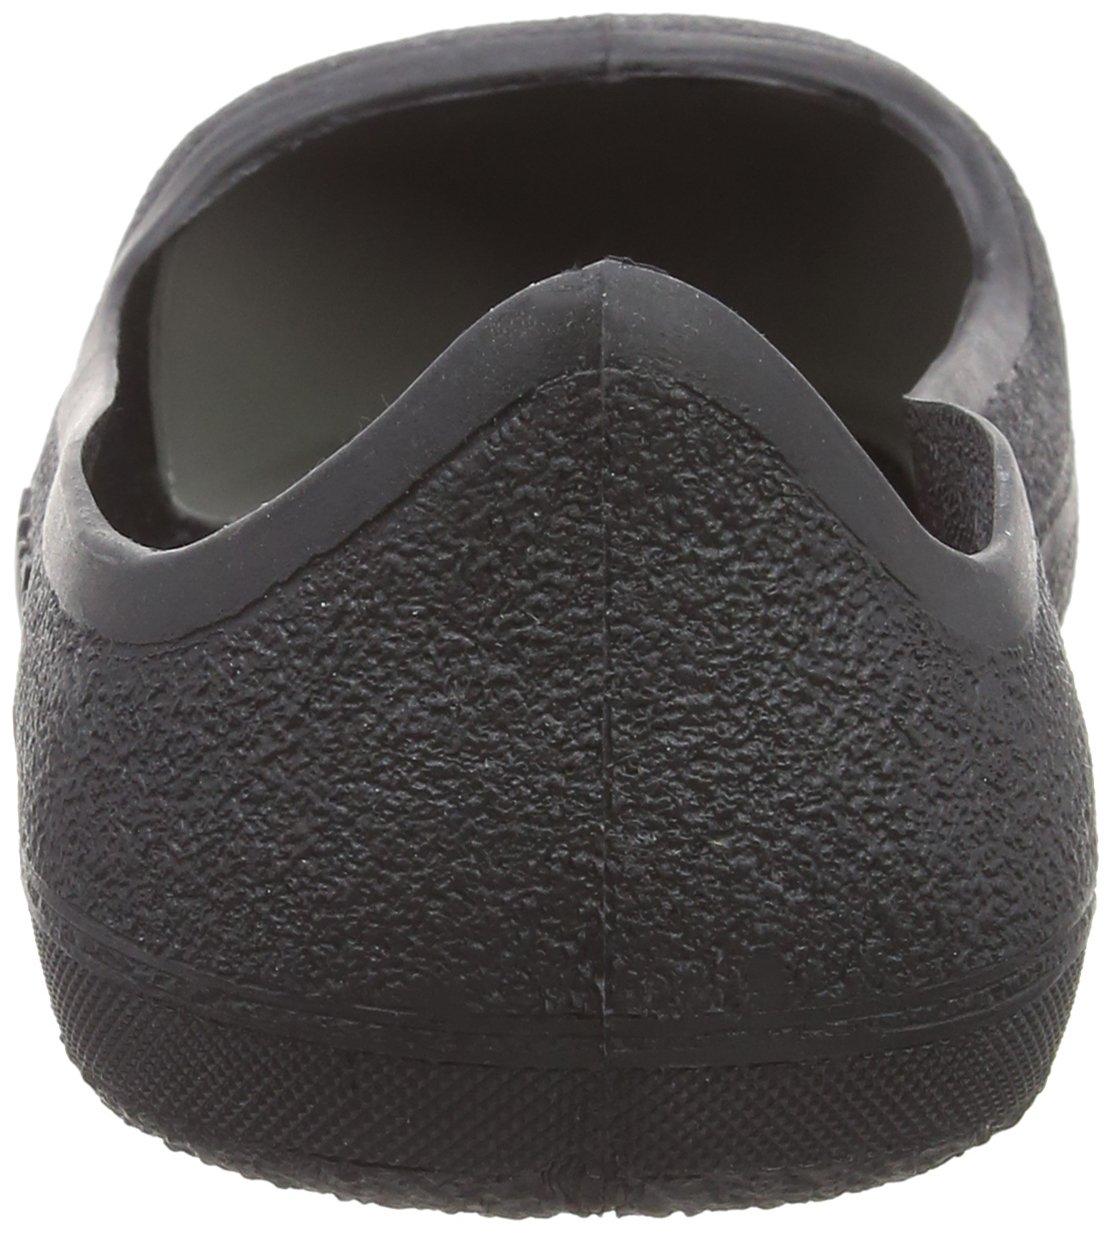 Black Impacto IMPACTOEXXS Impactoe Steel Toe Cap